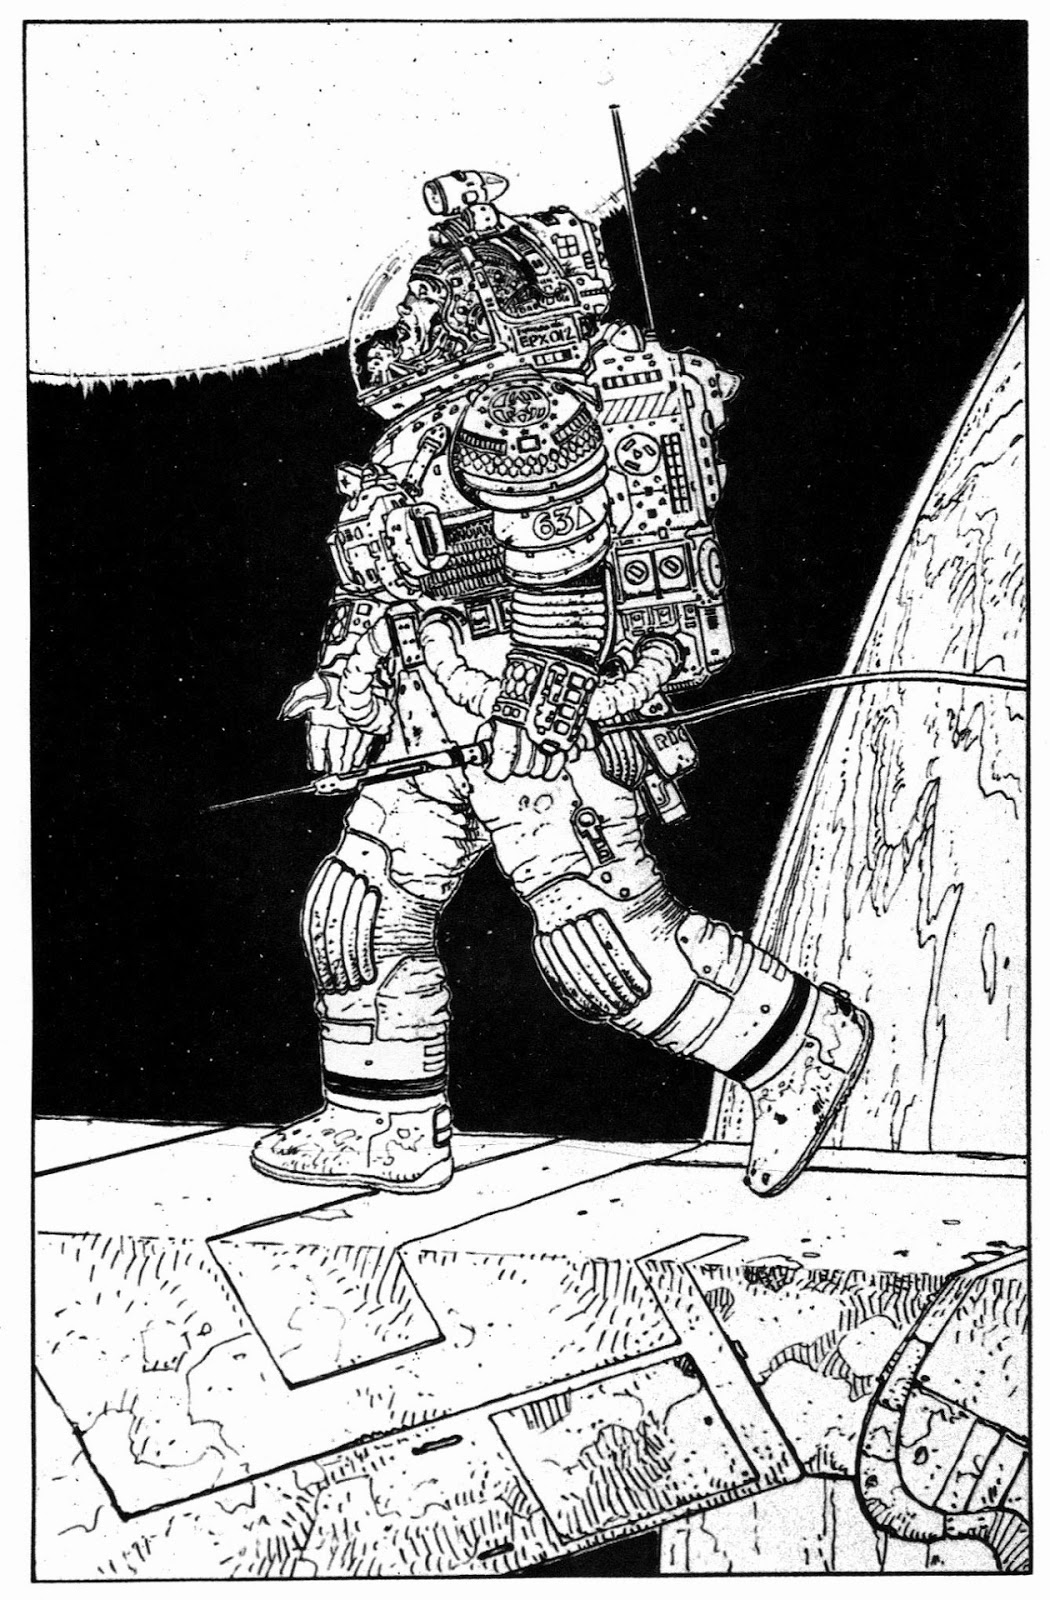 alien moebius astronaut suit 1.jpg